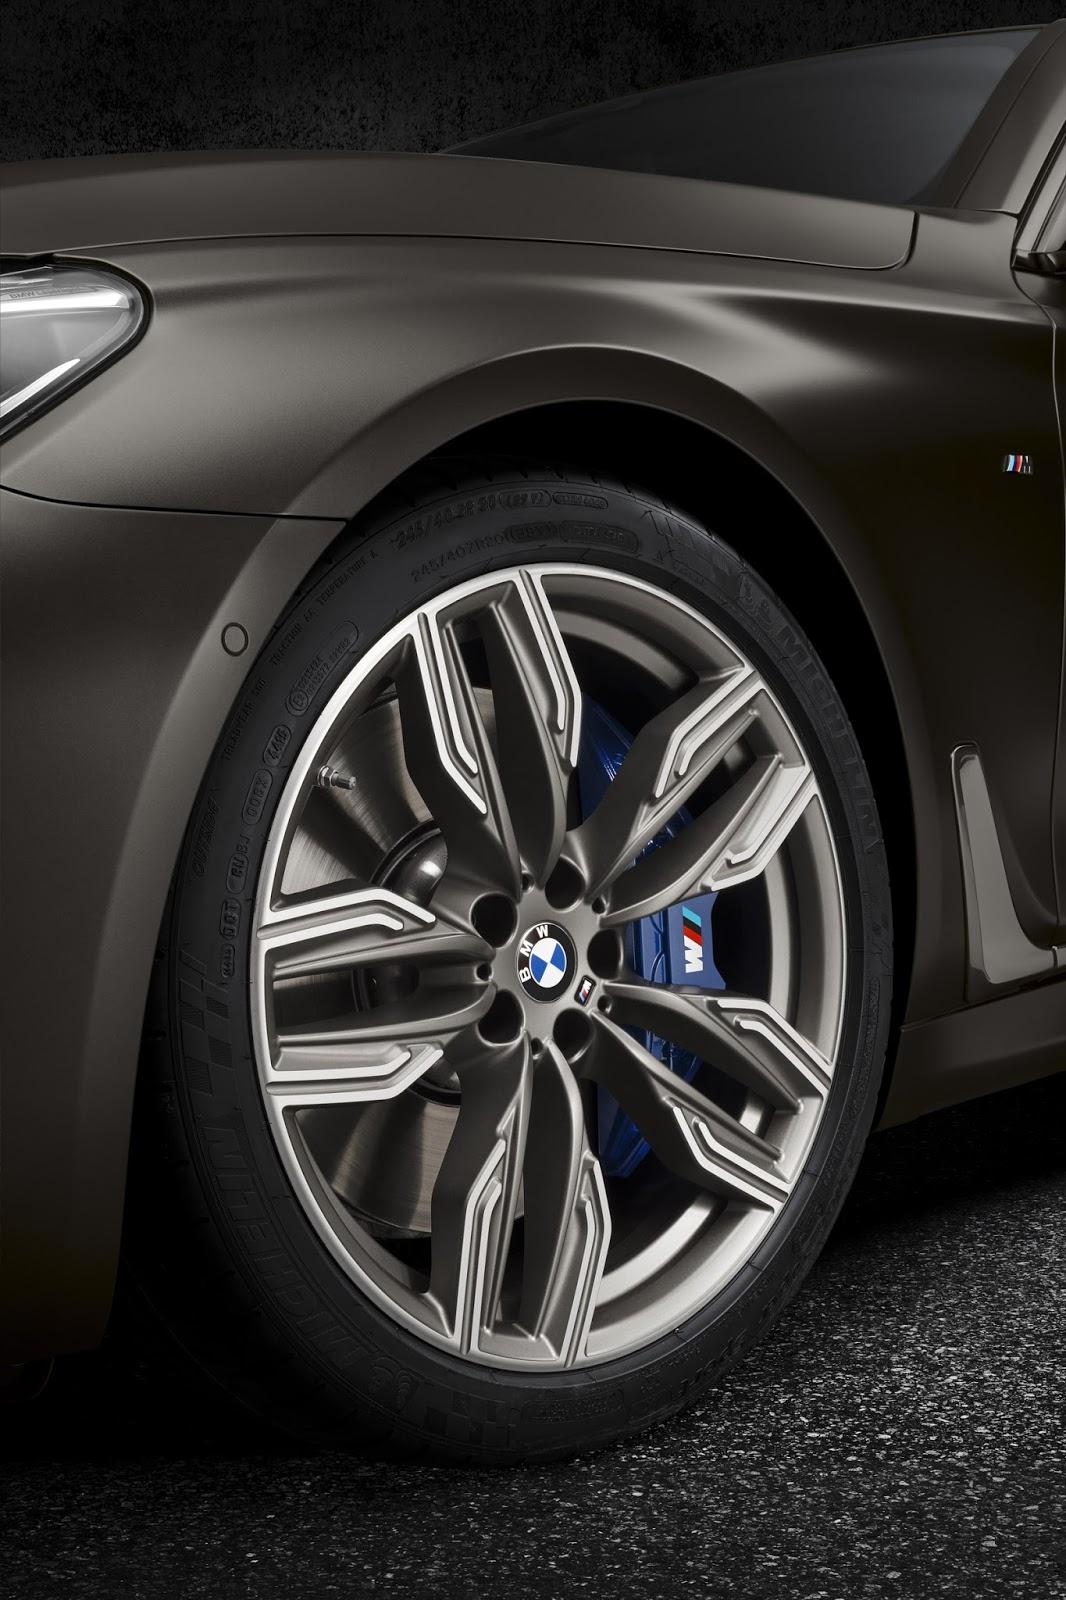 New BMW M760Li XDrive Gets Massive 66 Liter V12 Turbo With 600